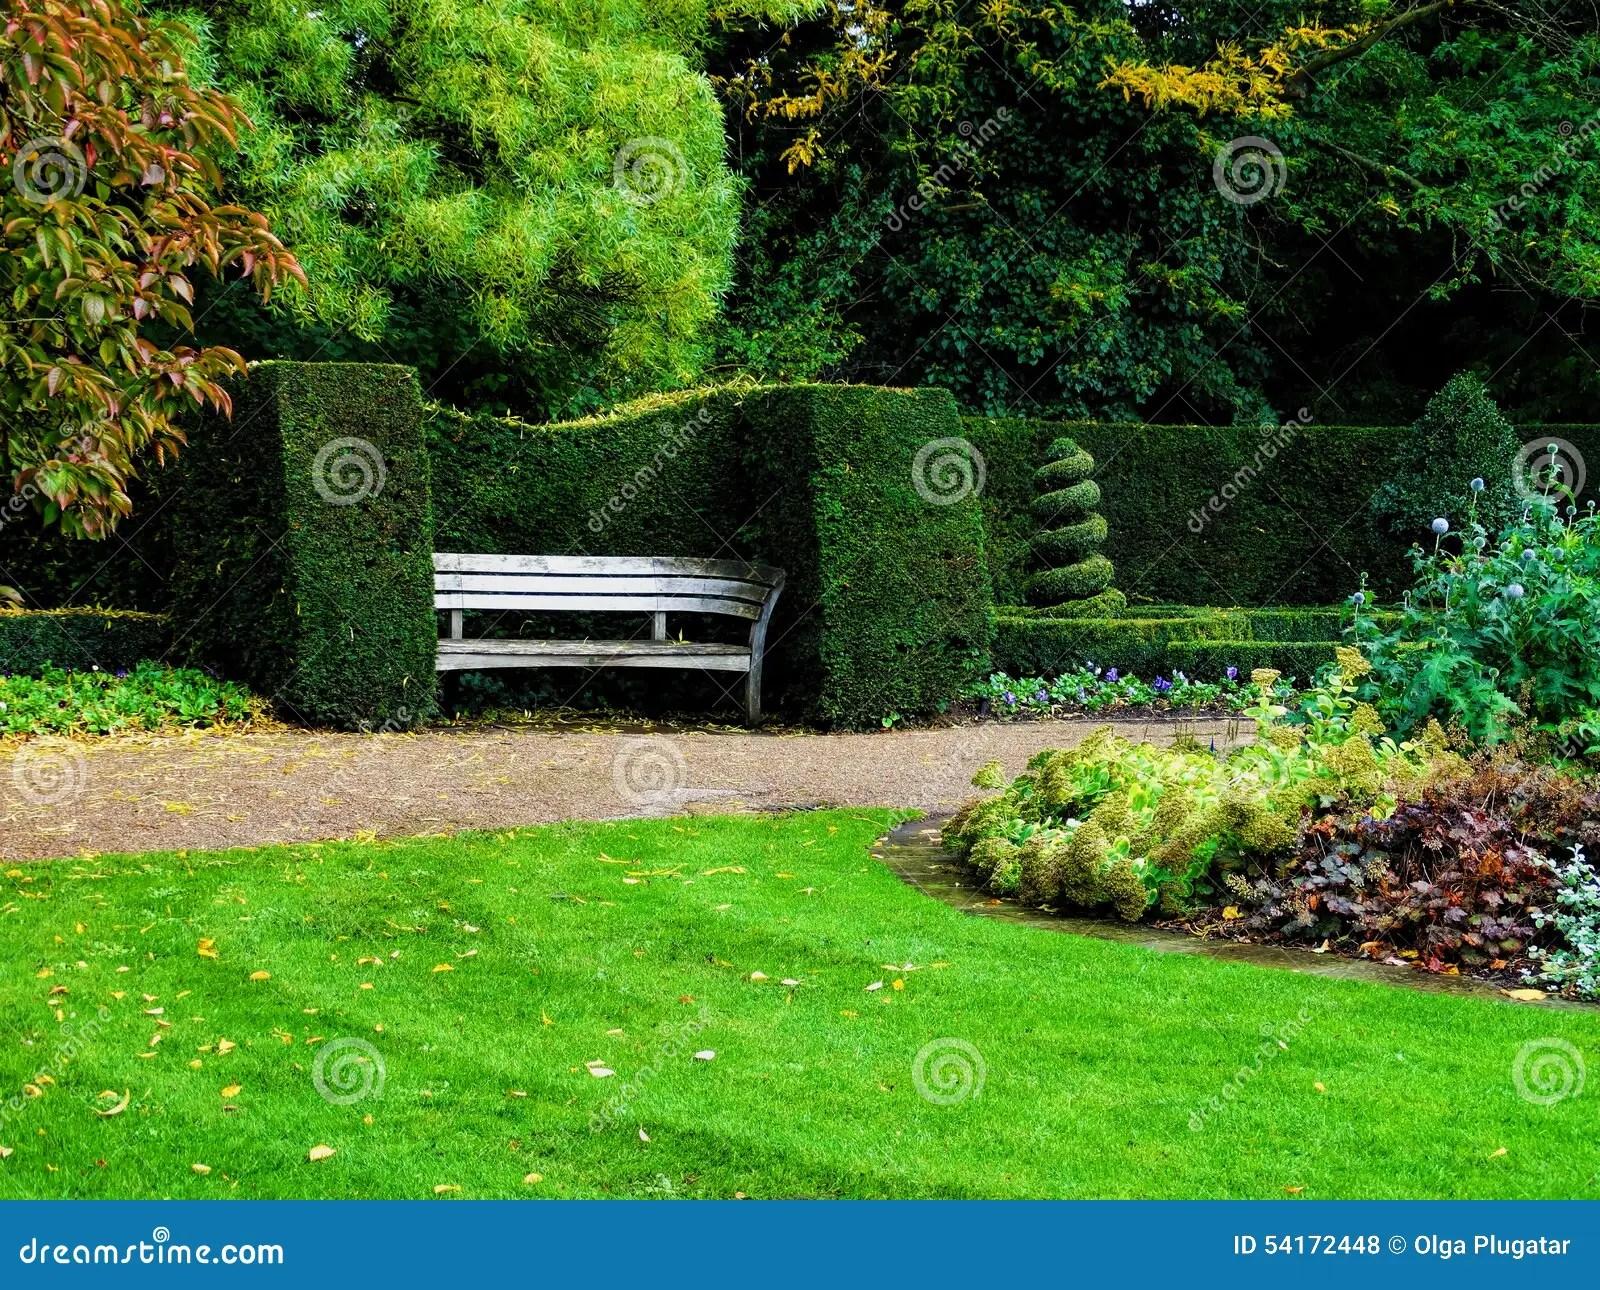 Bench In Nicely Trimmed Bushes In Regents Park London